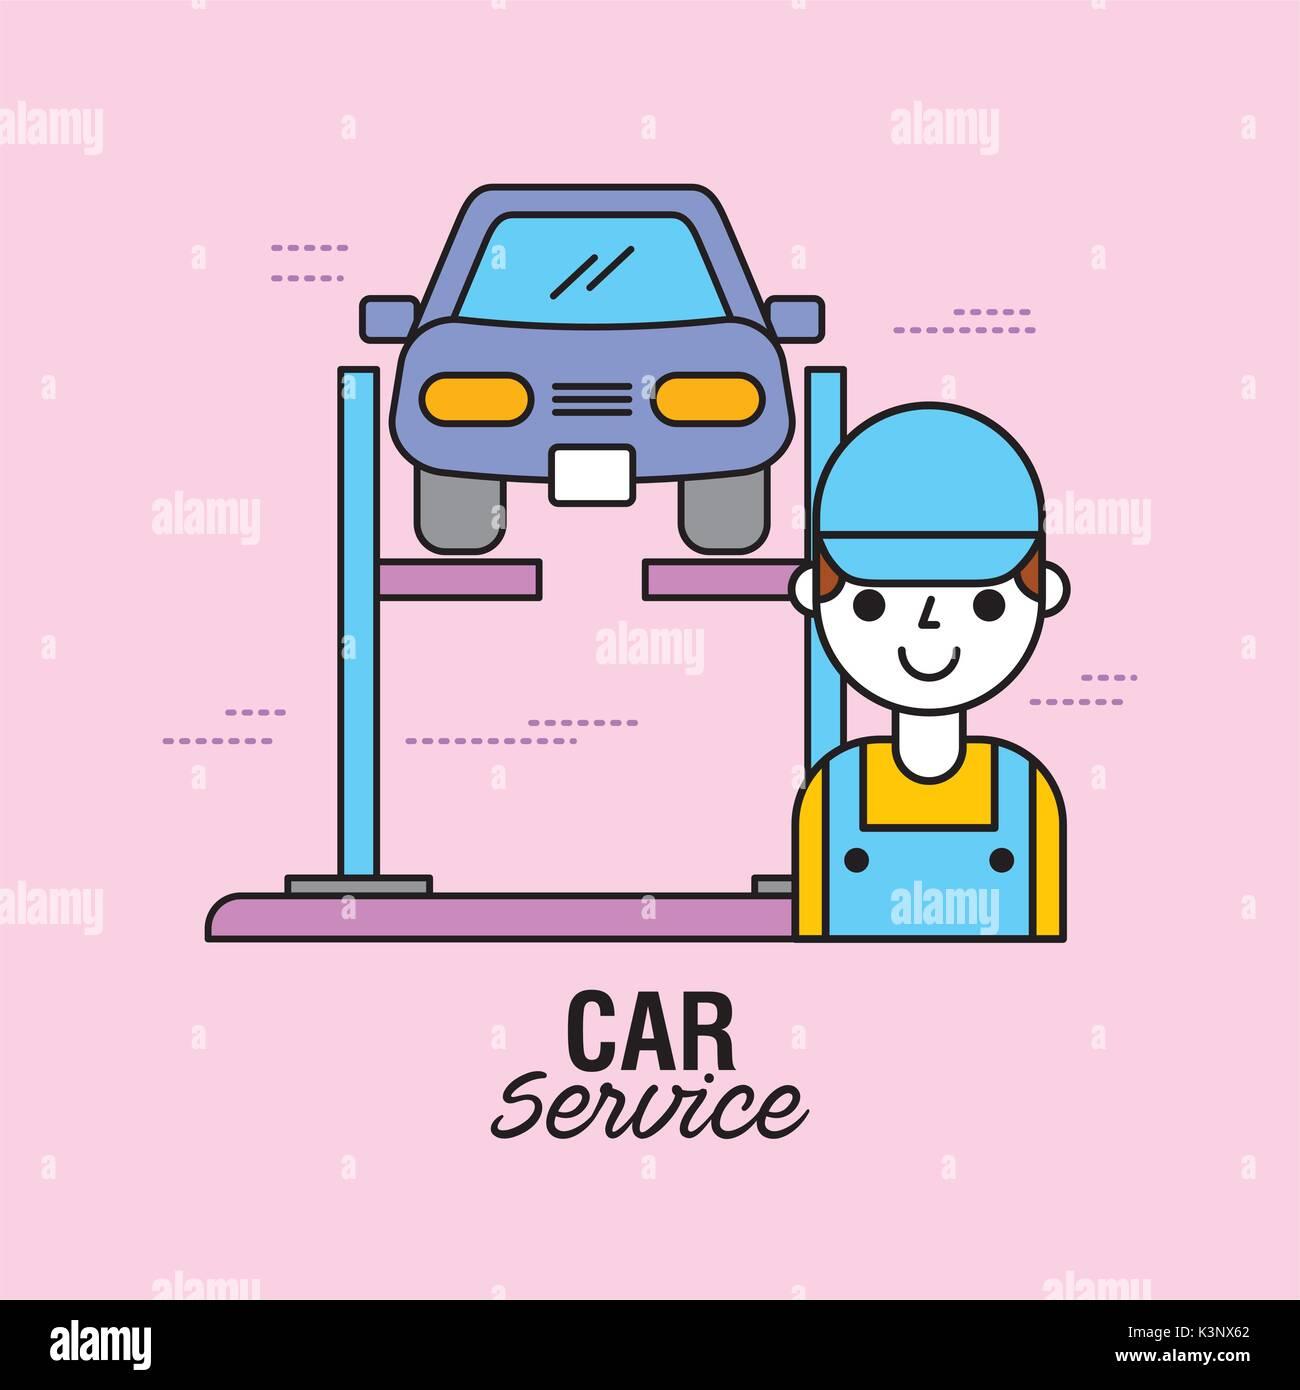 car service vehicle alignment auto technician equipment - Stock Image